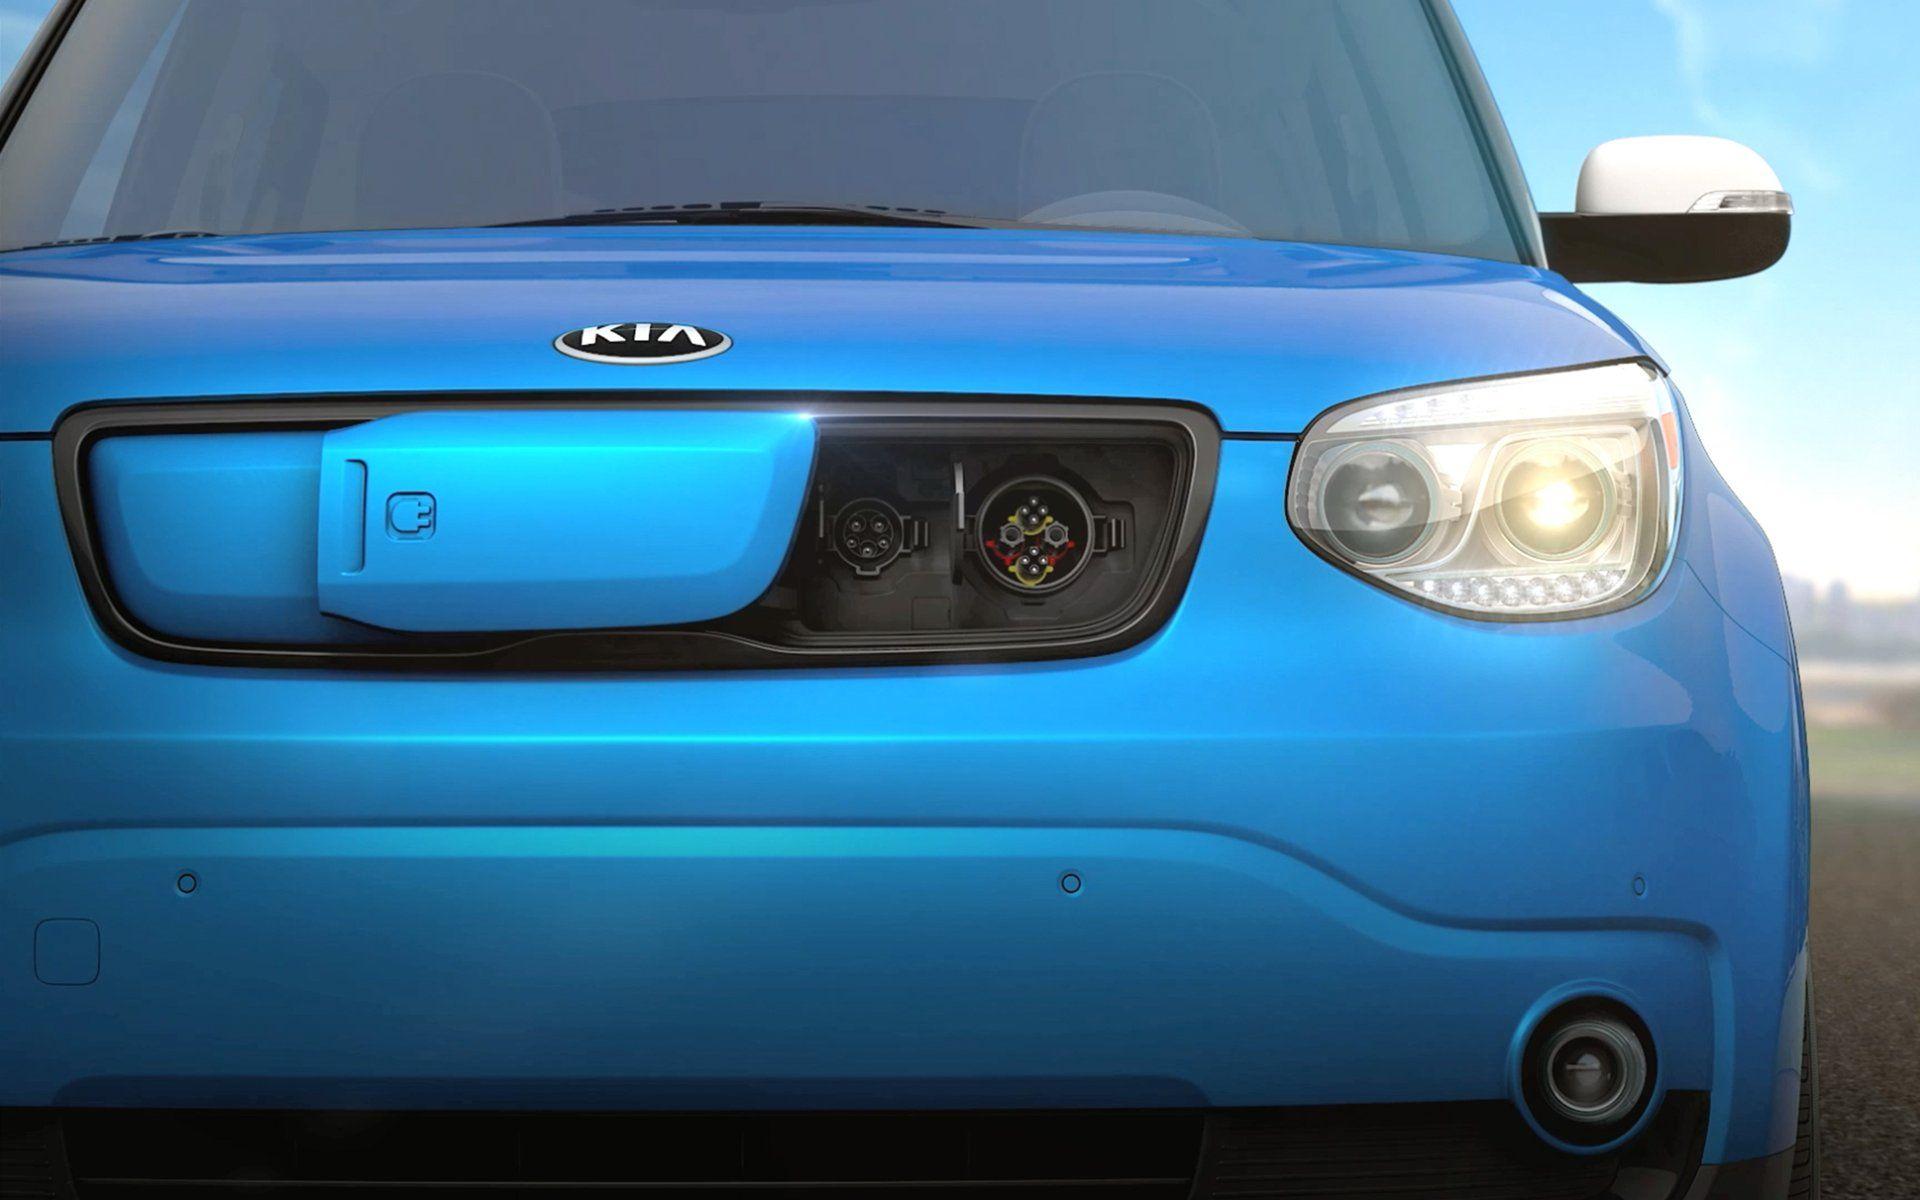 year car of canadian soul nabs kia award k blue the ev green